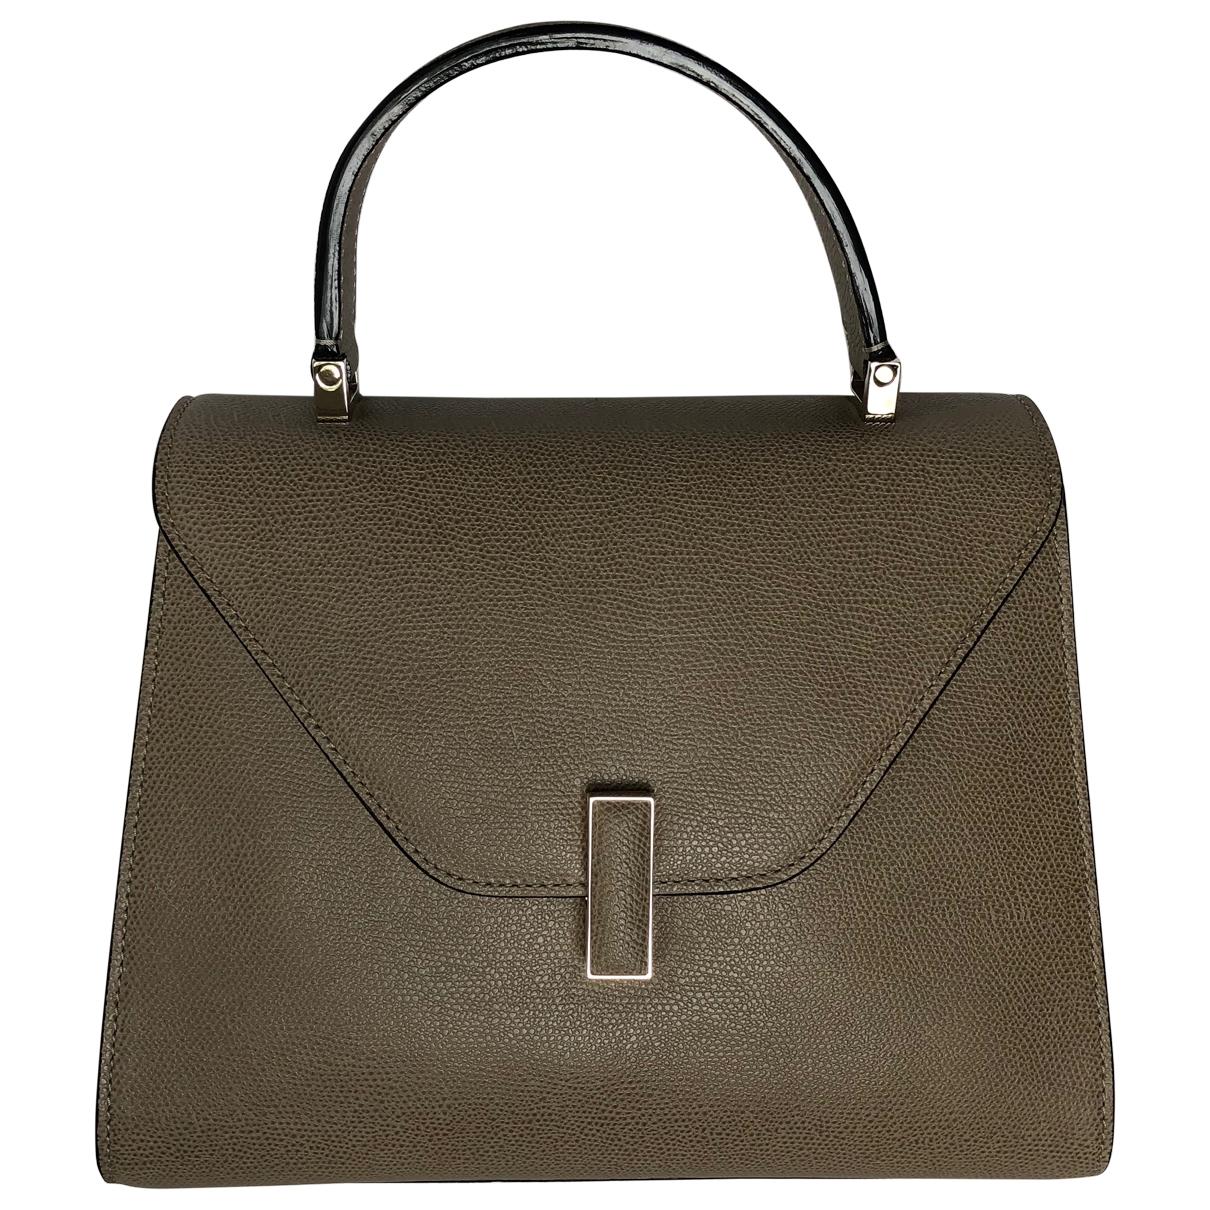 Valextra Iside Handtasche in  Beige Leder